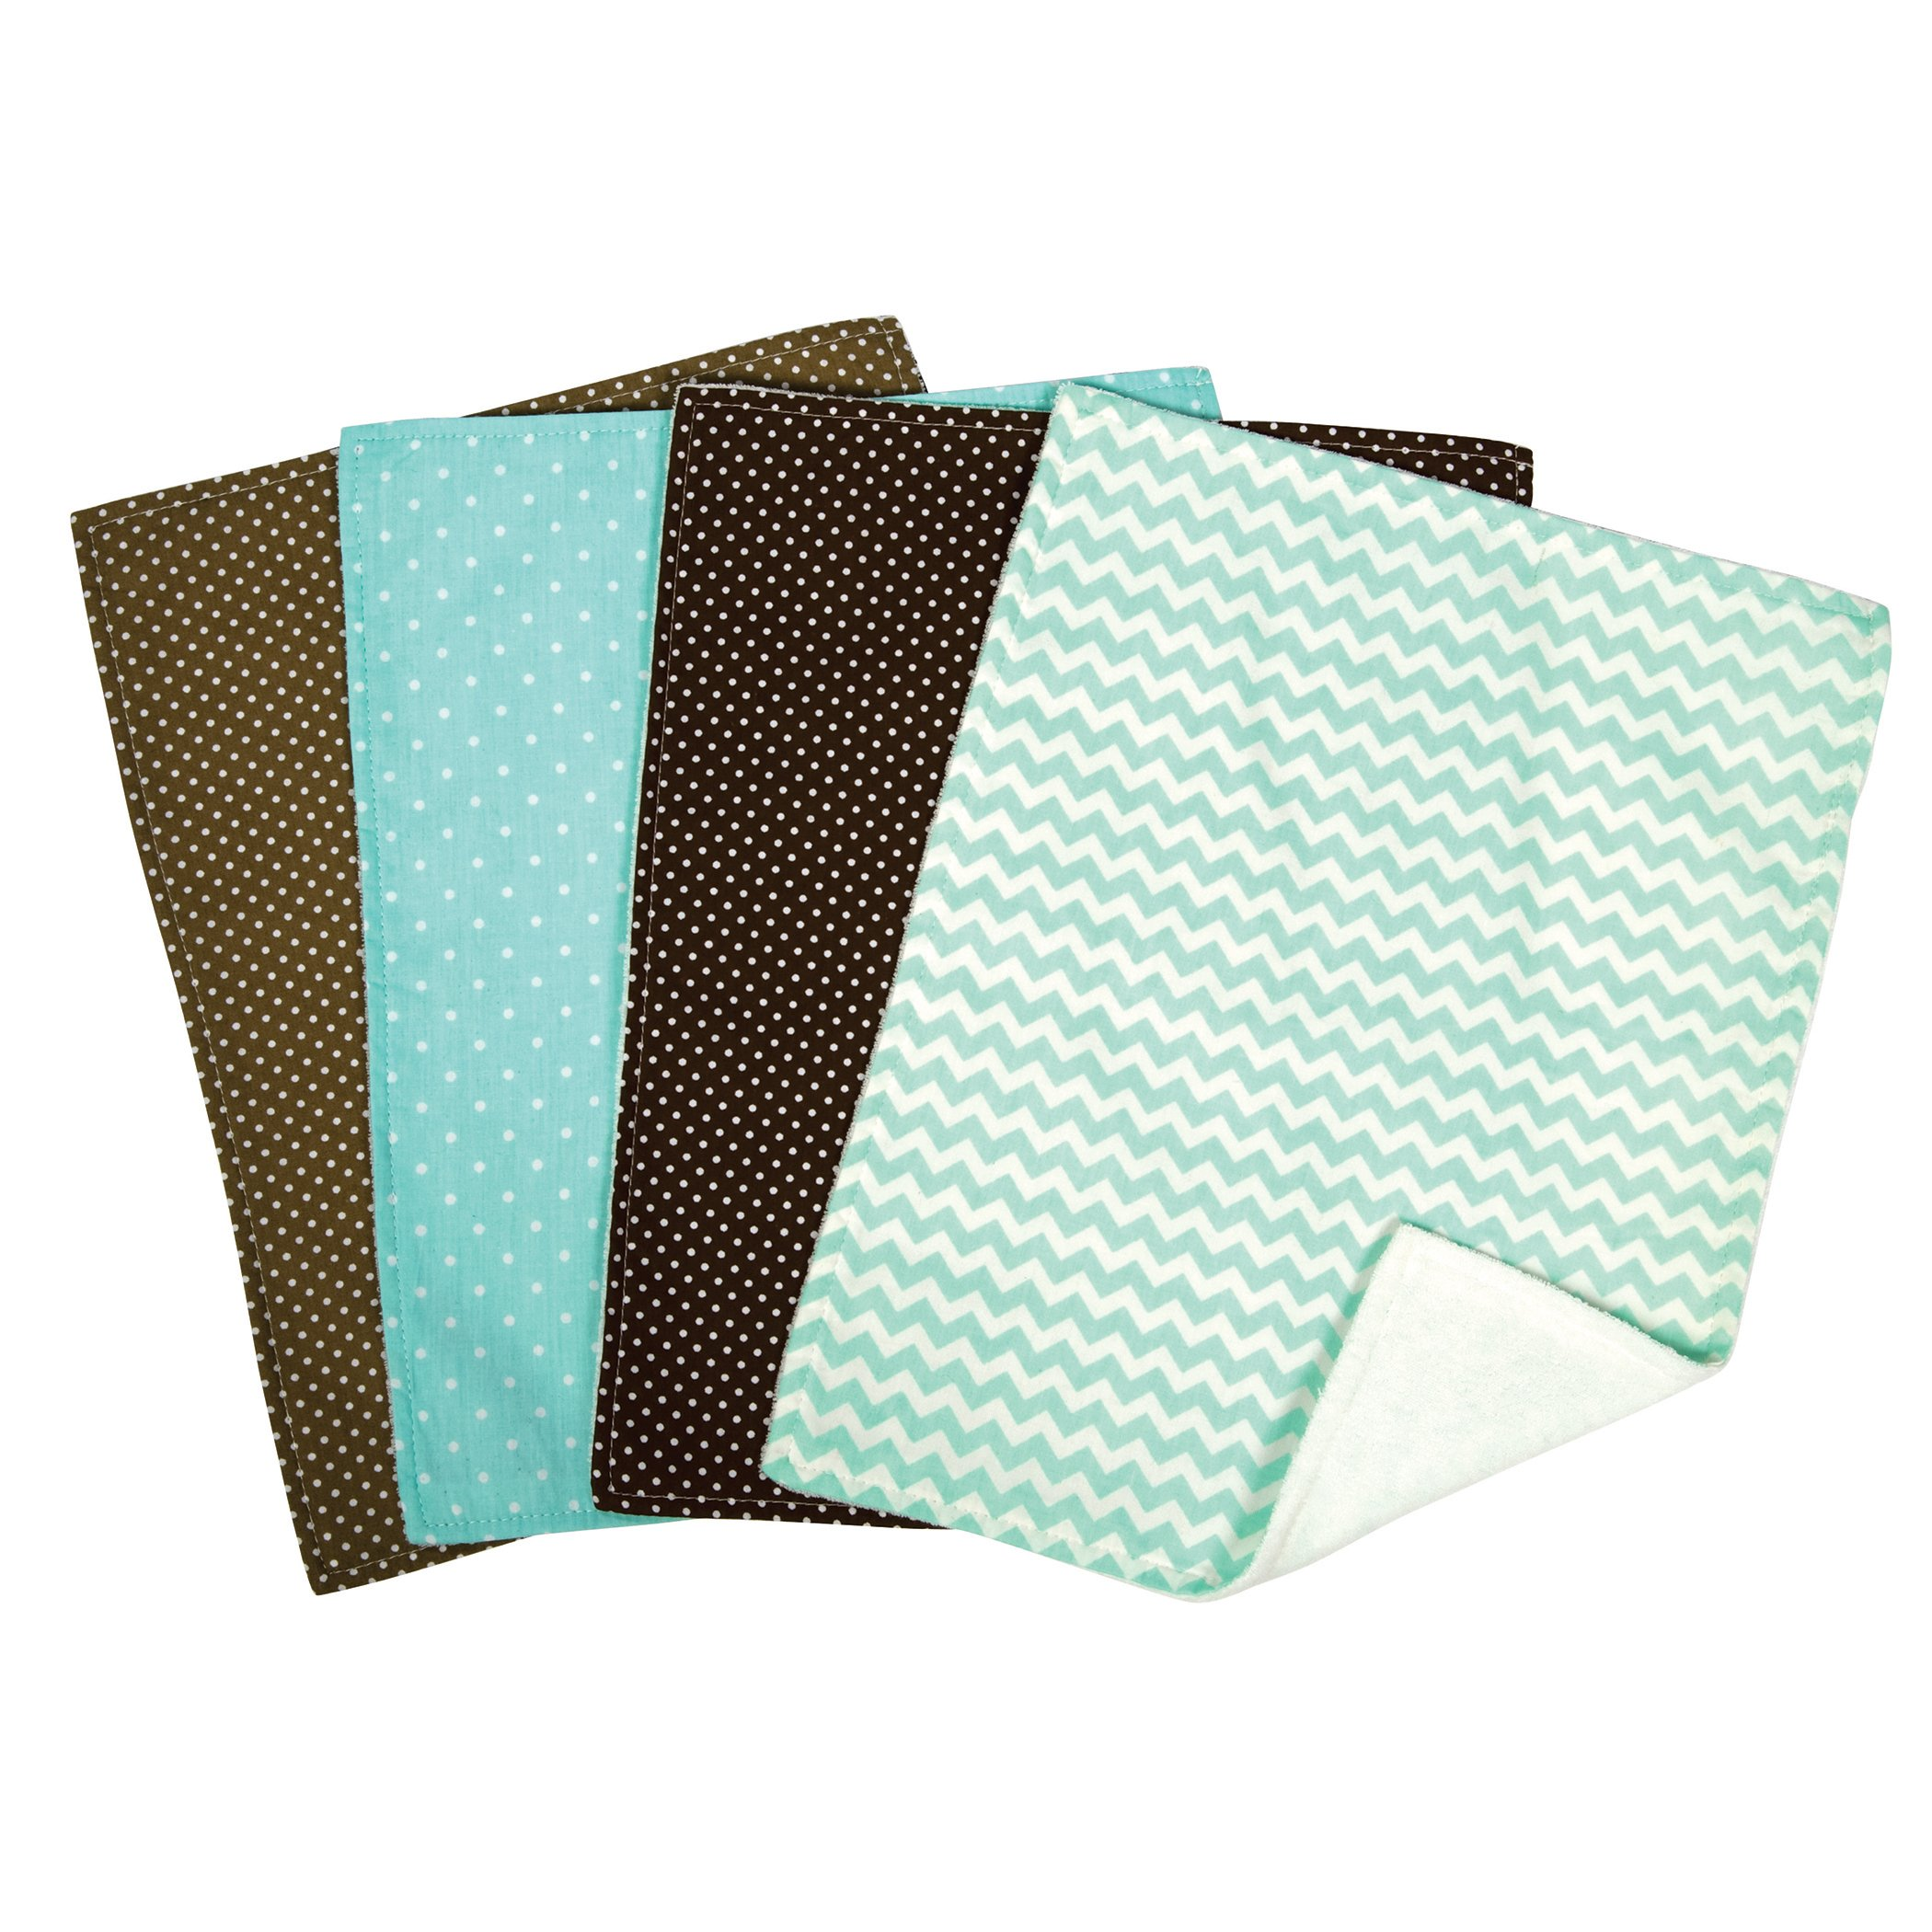 Trend Lab Cocoa Mint Burp Cloth Set, 4-Count